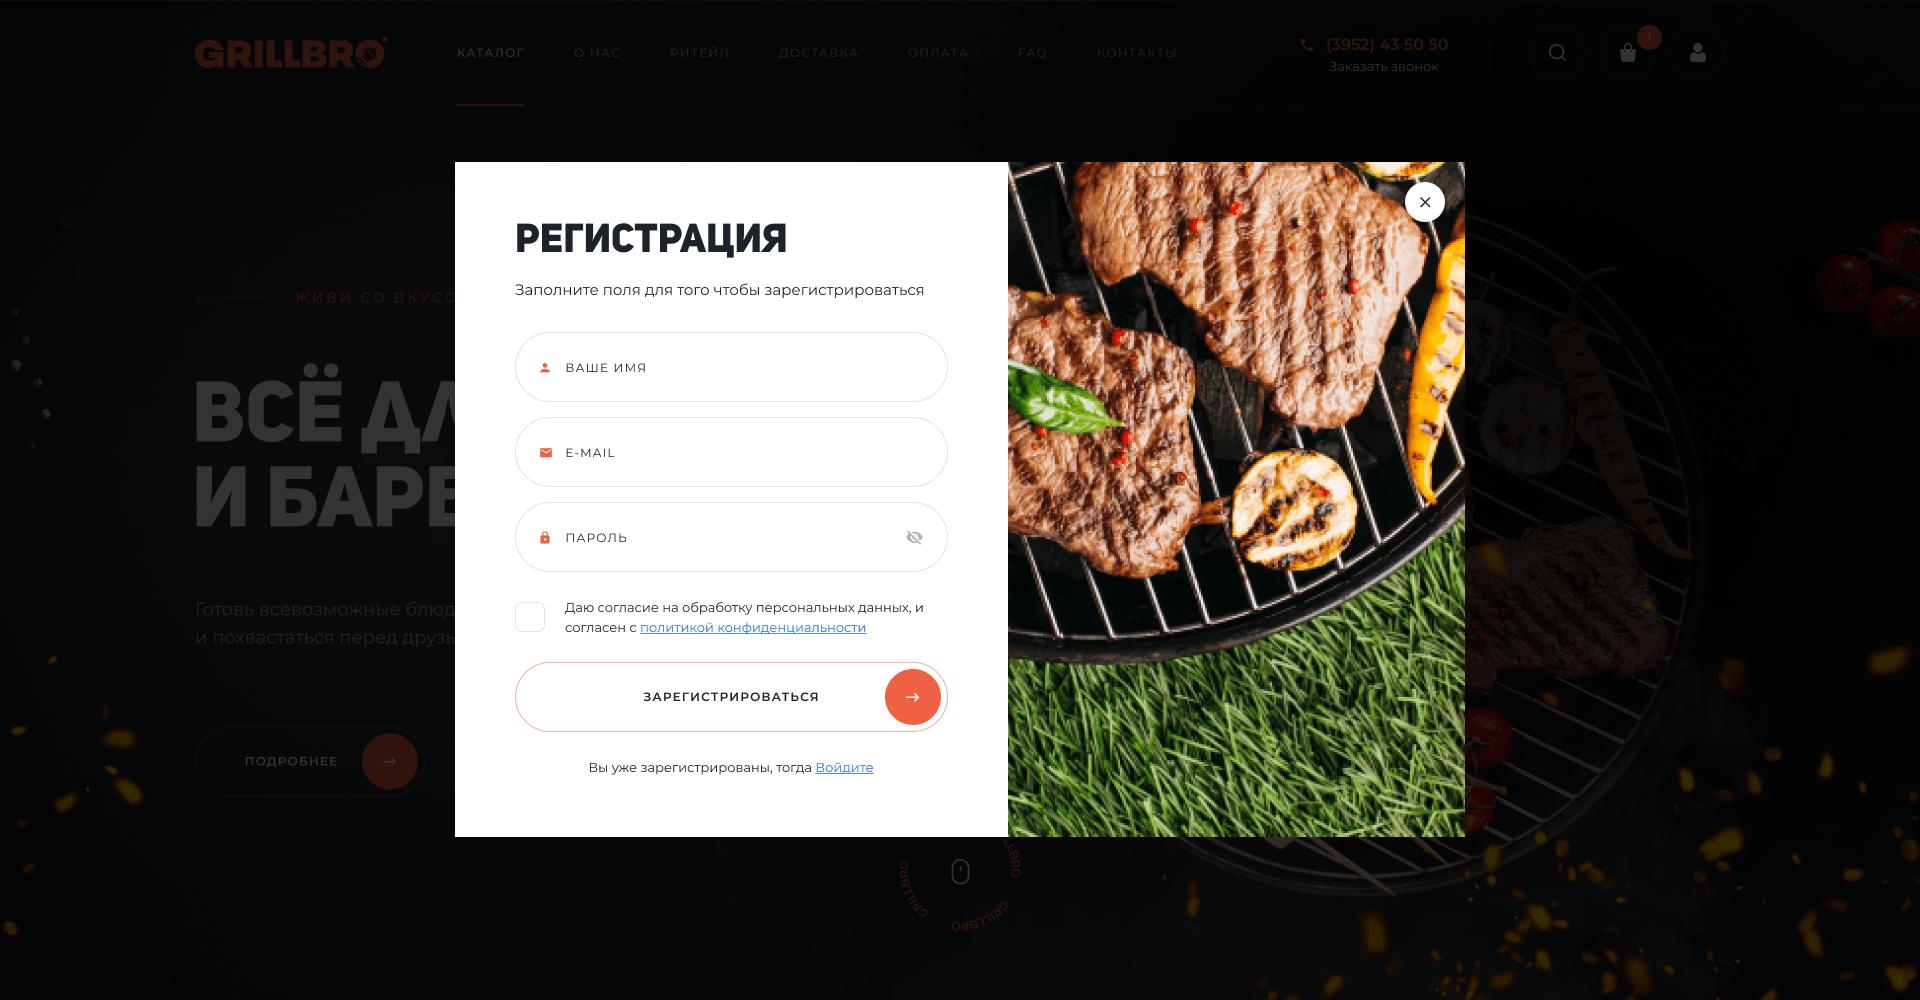 GrillBro_03.0_Home_Registration_1.0